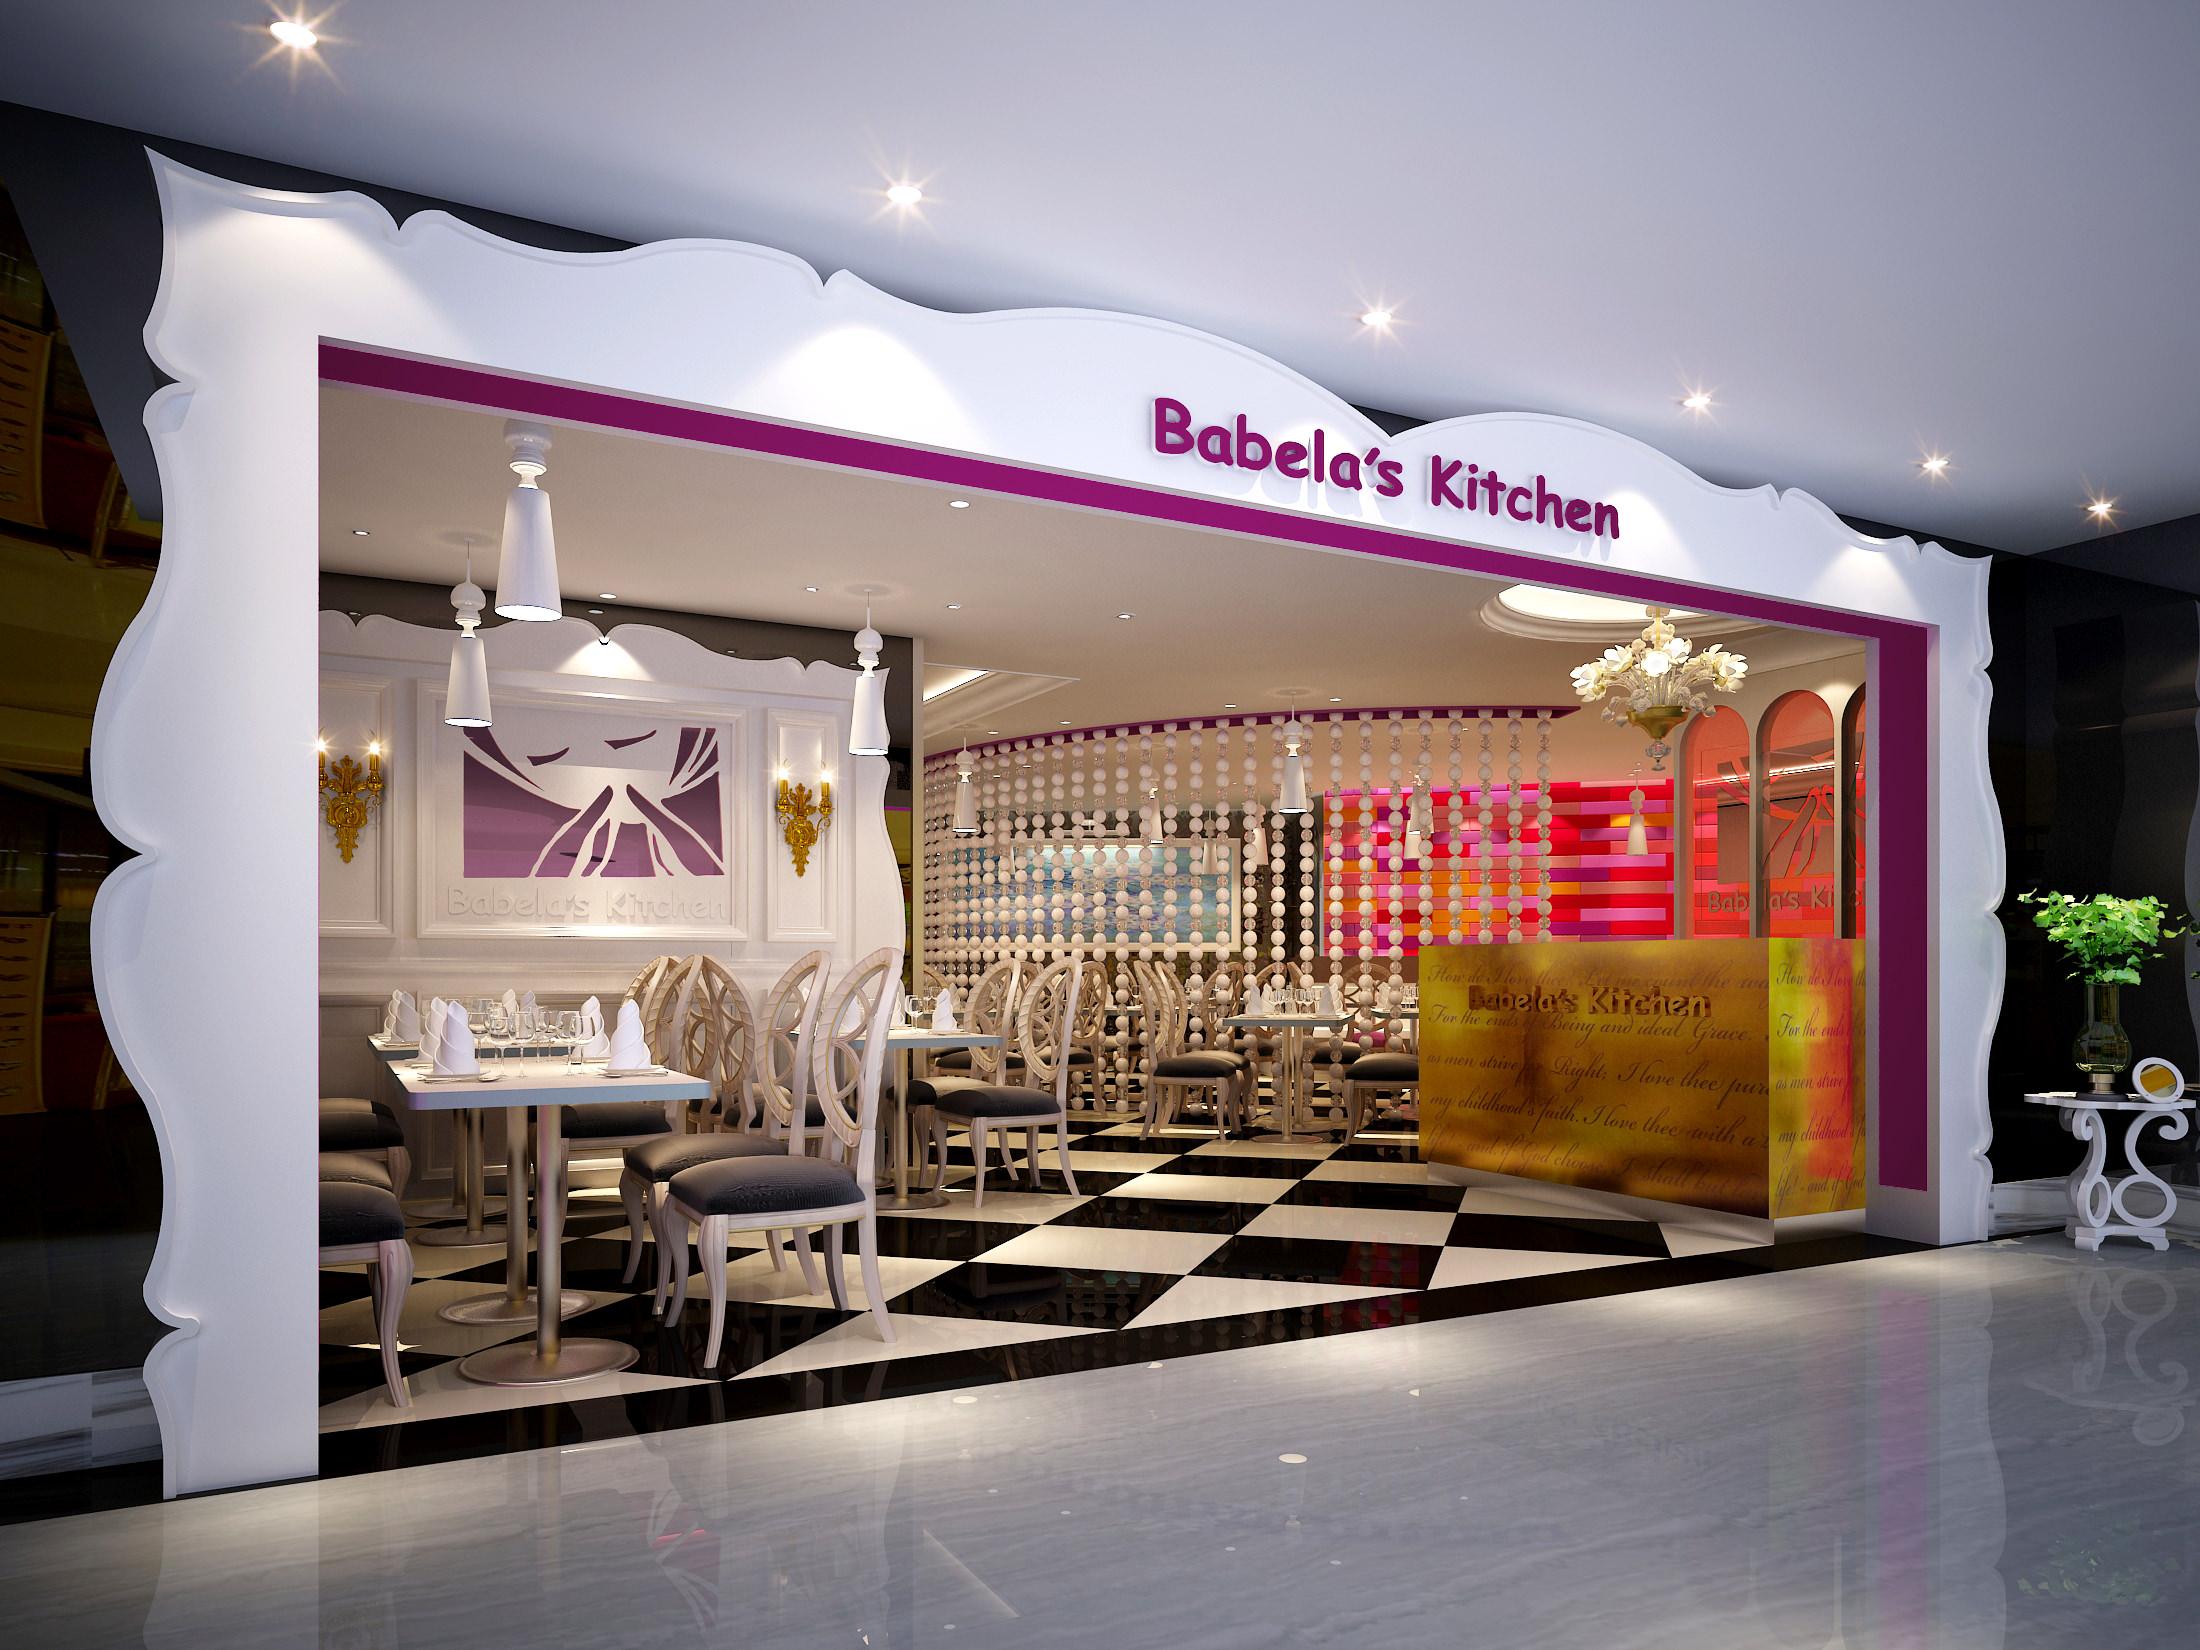 Restaurant Kitchen 3d Model 3d cafe restaurant | cgtrader